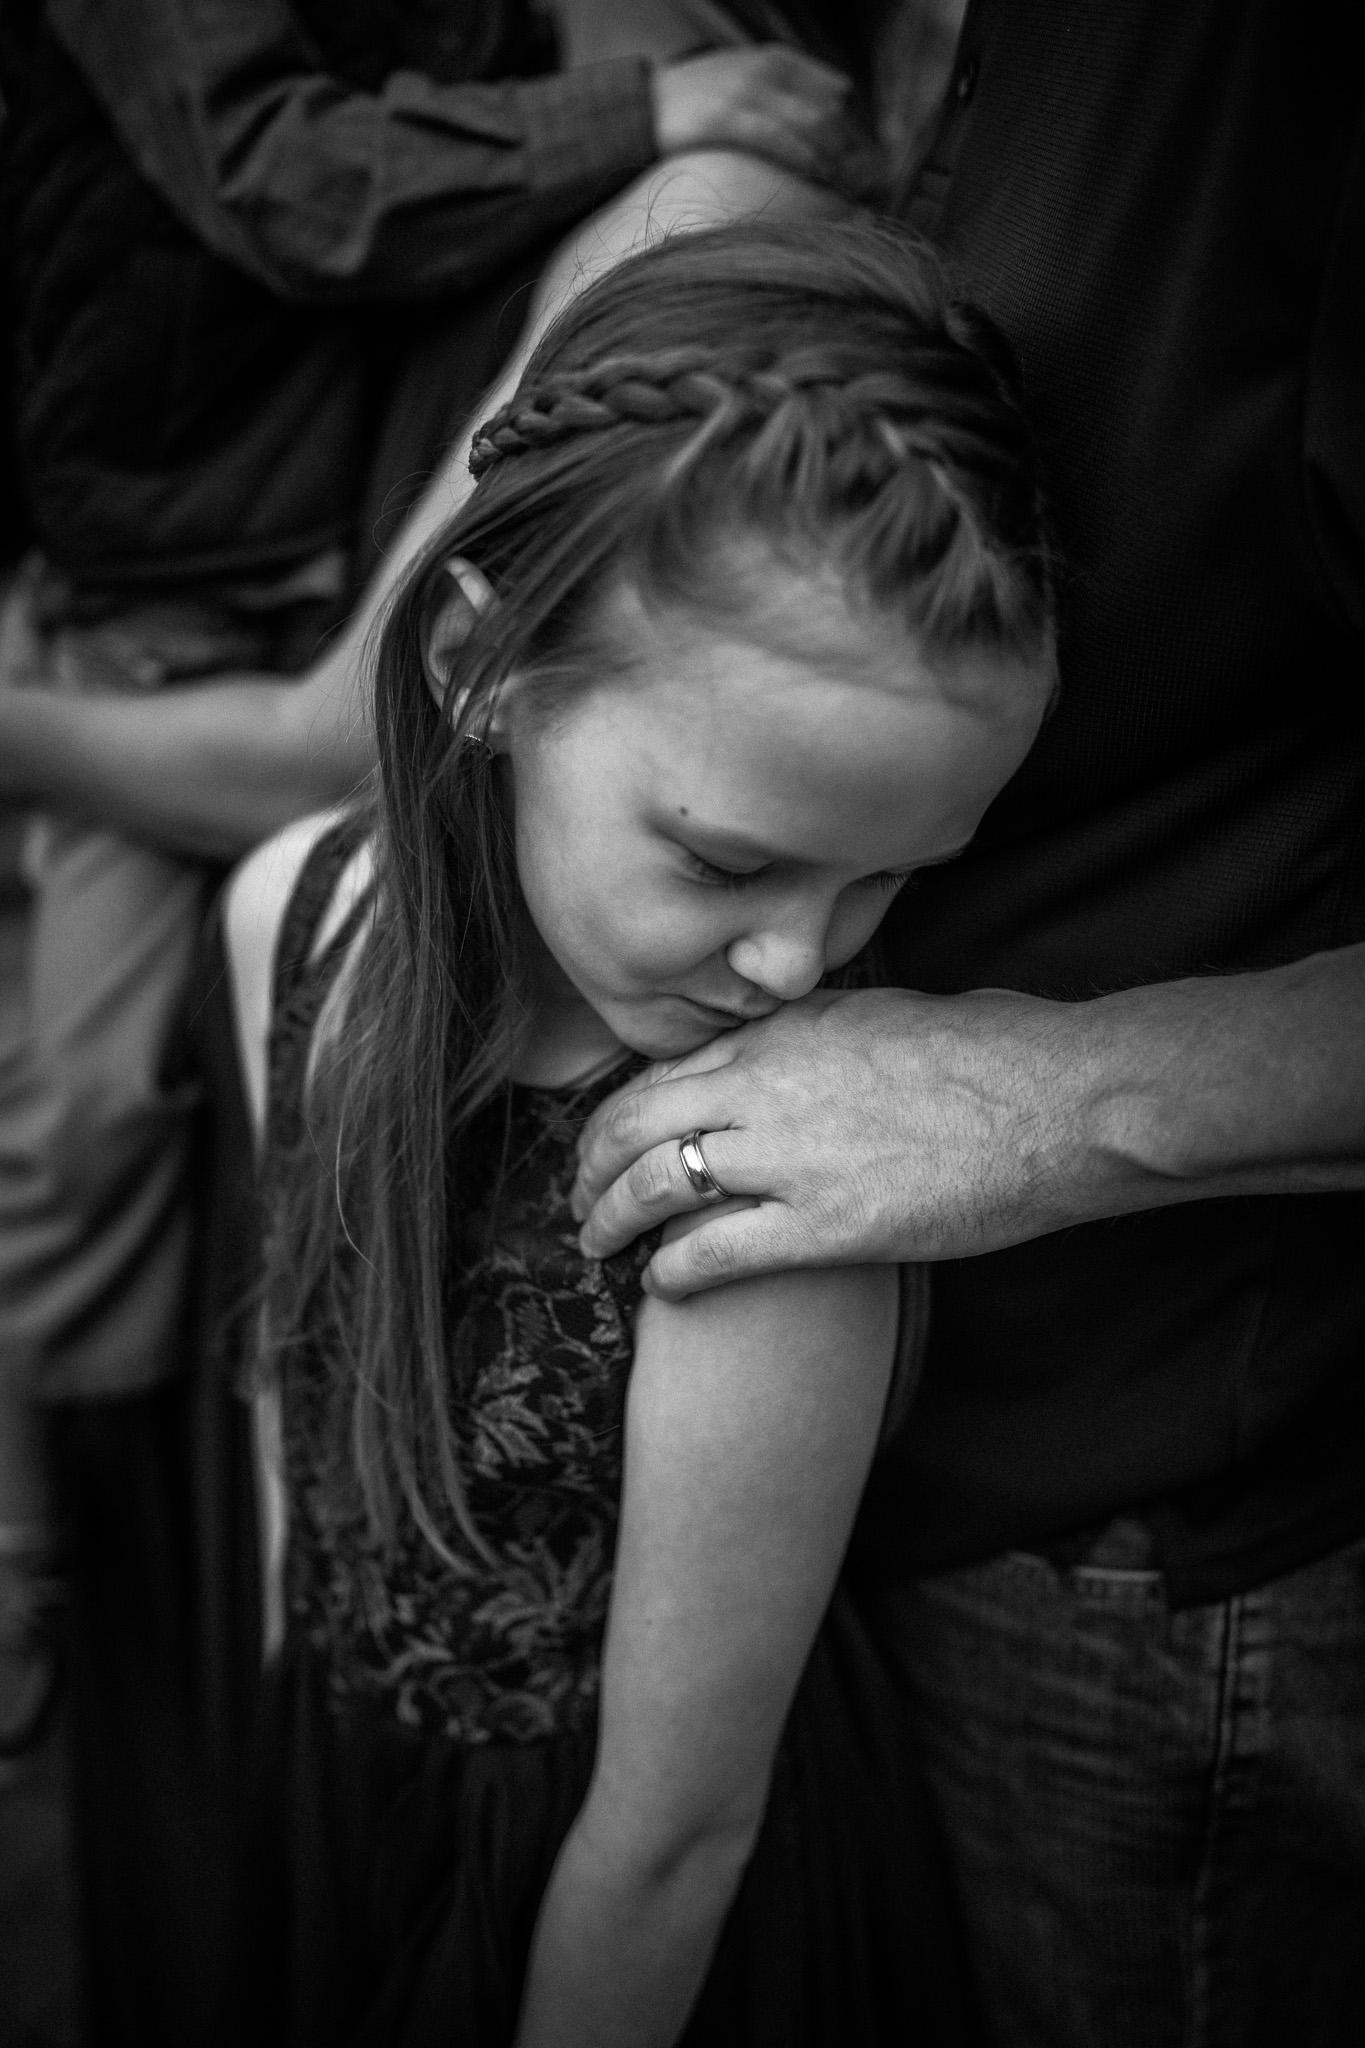 little girl kissing dad's hands